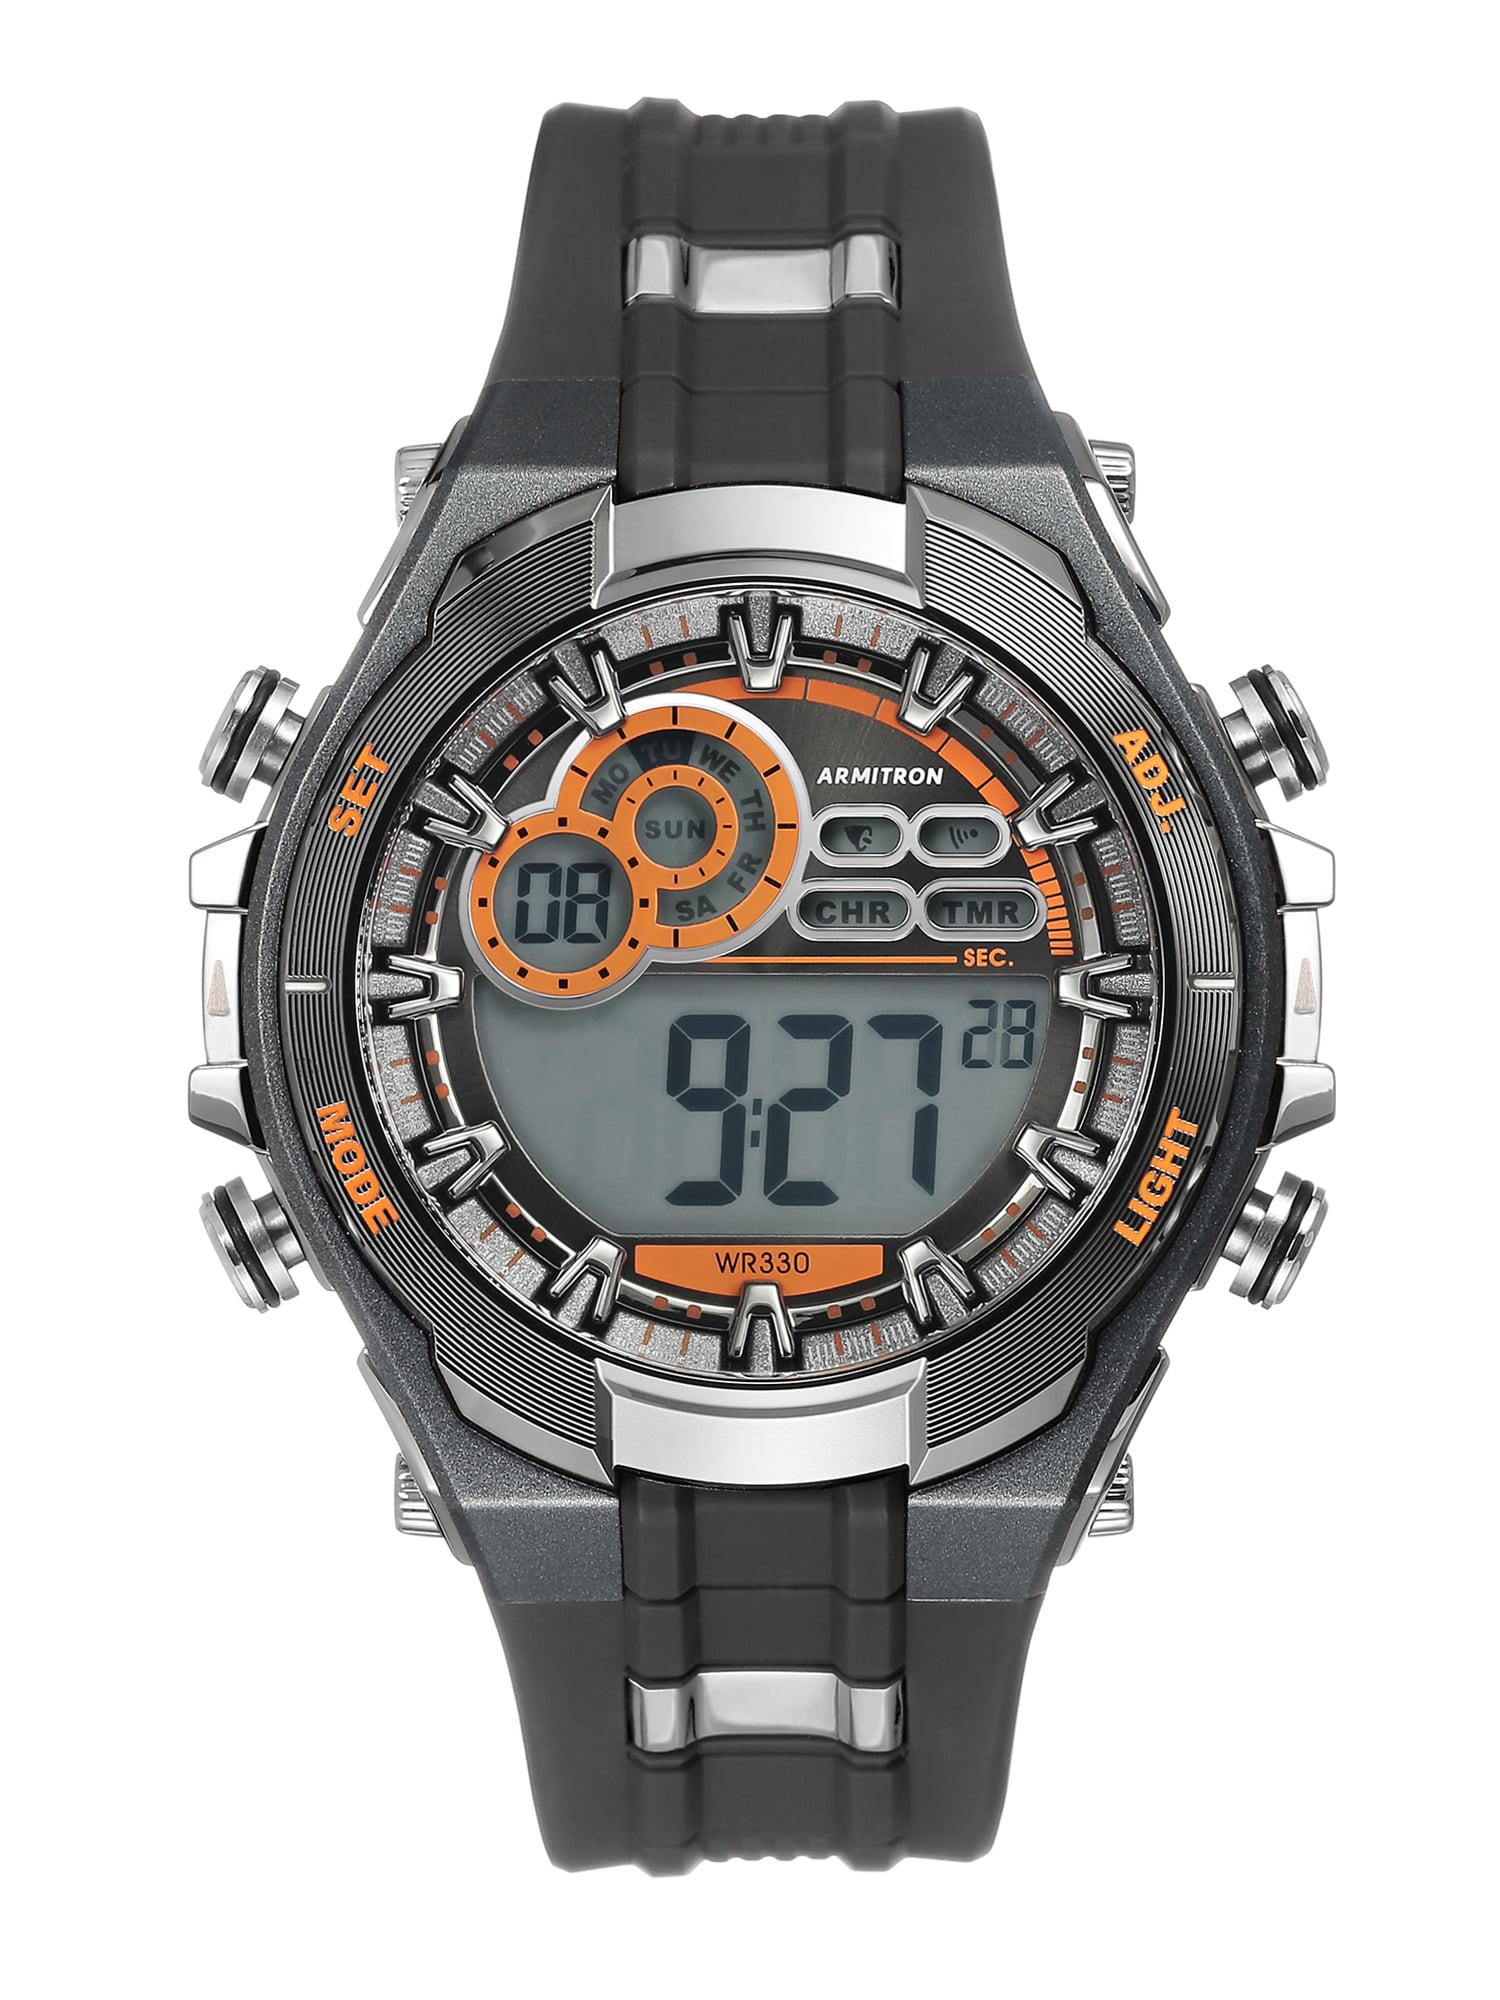 2ecdce5faf6a Armitron - Men's Multi-Functional Digital Gray and Black Watch - Walmart.com